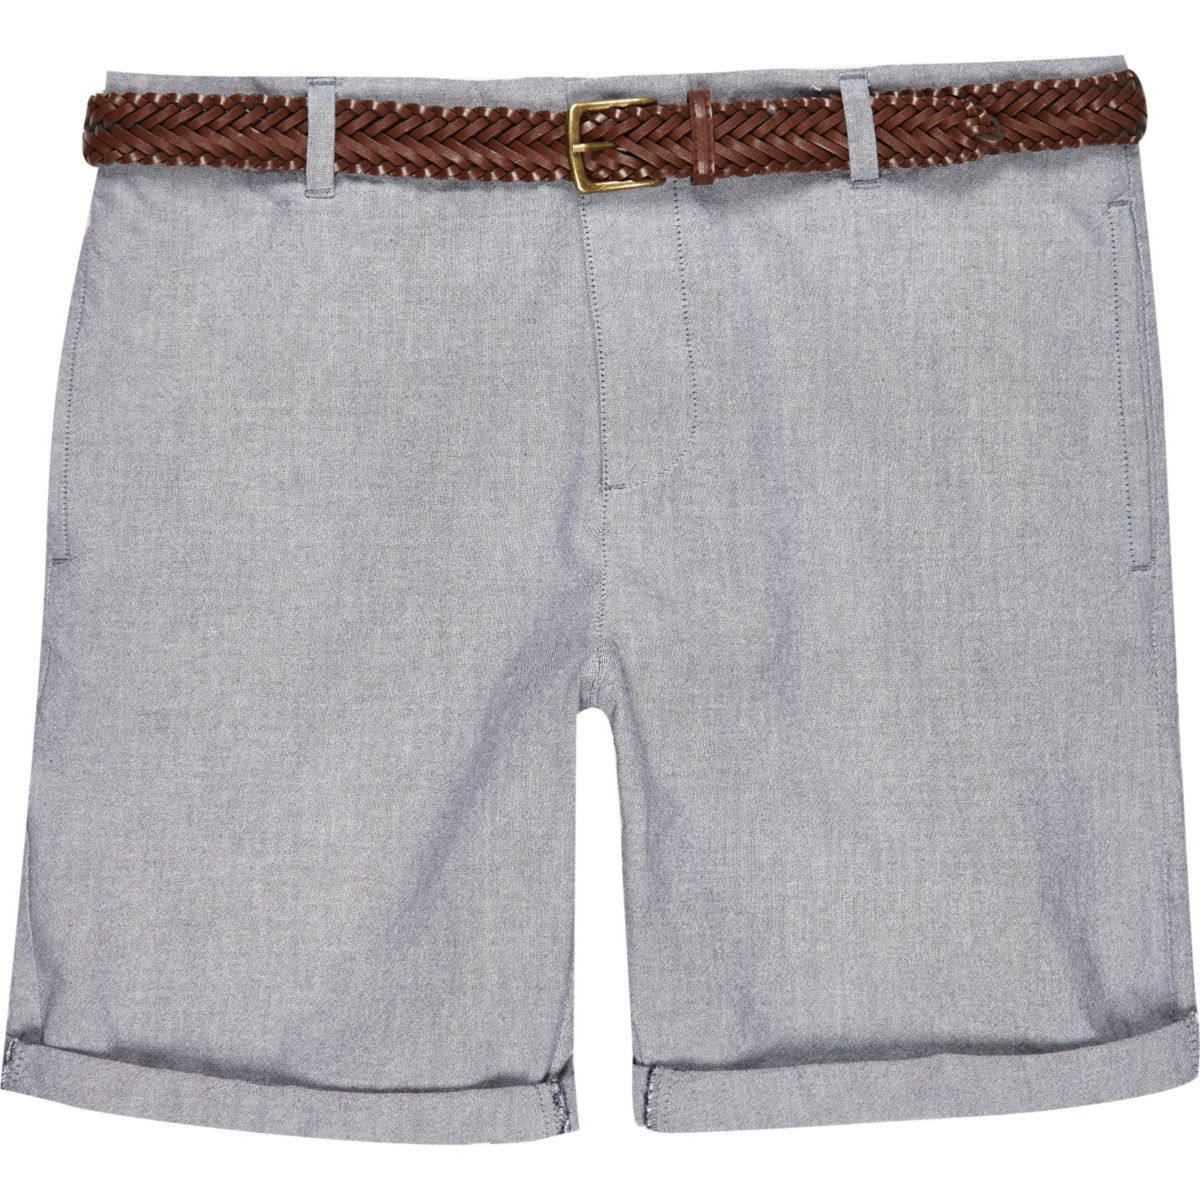 Navy Oxford belted bermuda shorts